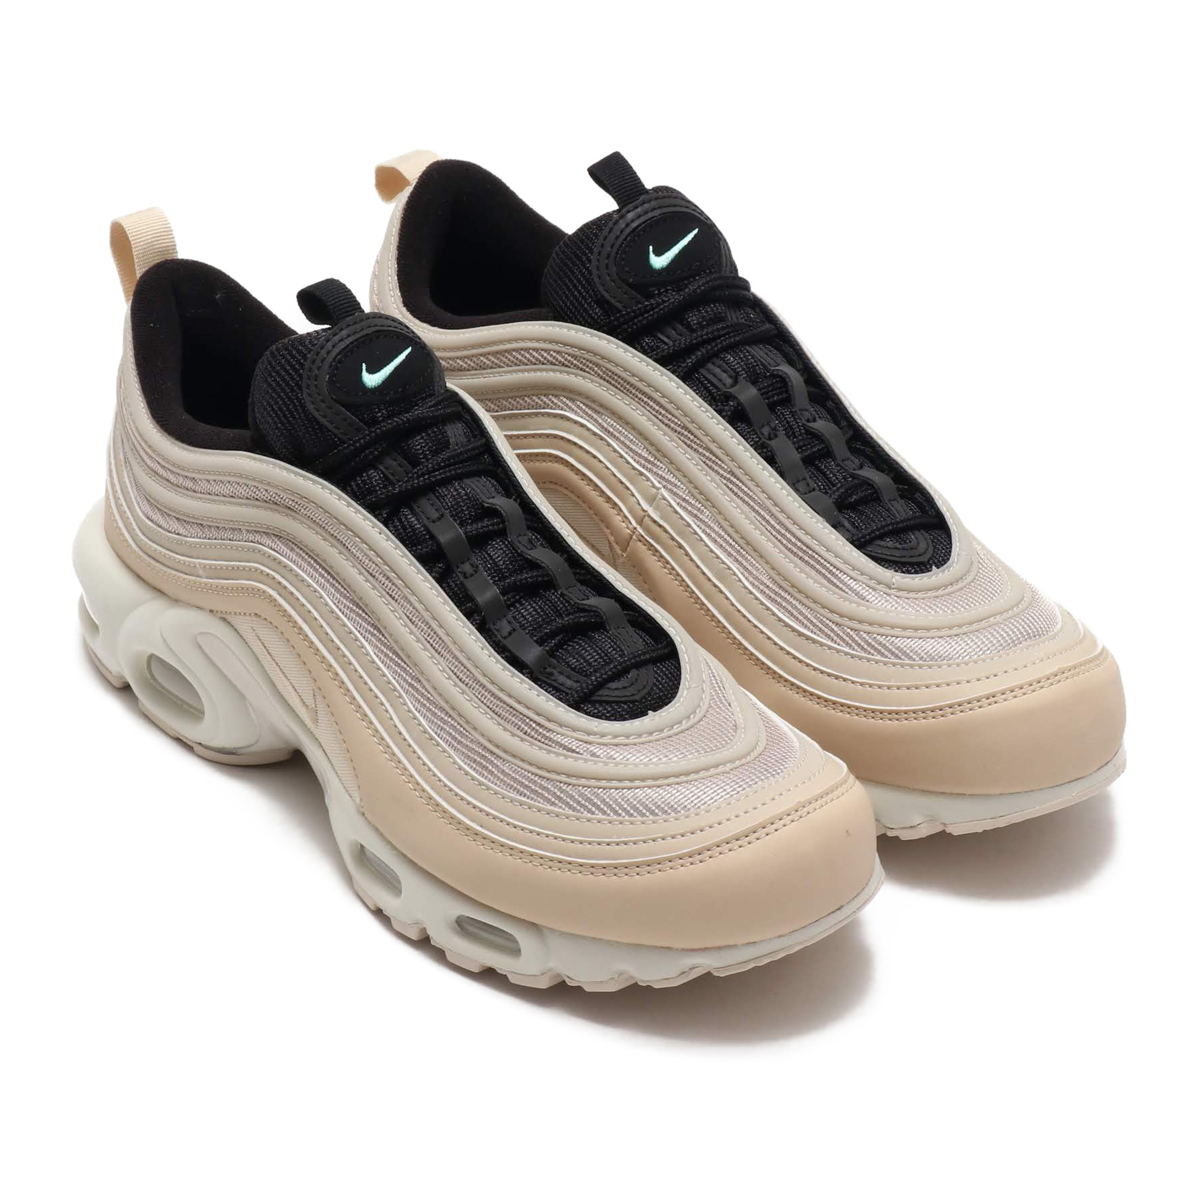 separation shoes a5689 4841f ○8月1日(水)発売・お取り寄せ商品○ NIKE AIR MAX PLUS  97 (ナイキ エア マックス プラス 97) (LT OREWOOD  BRNRATTAN-STRING-BLACK)